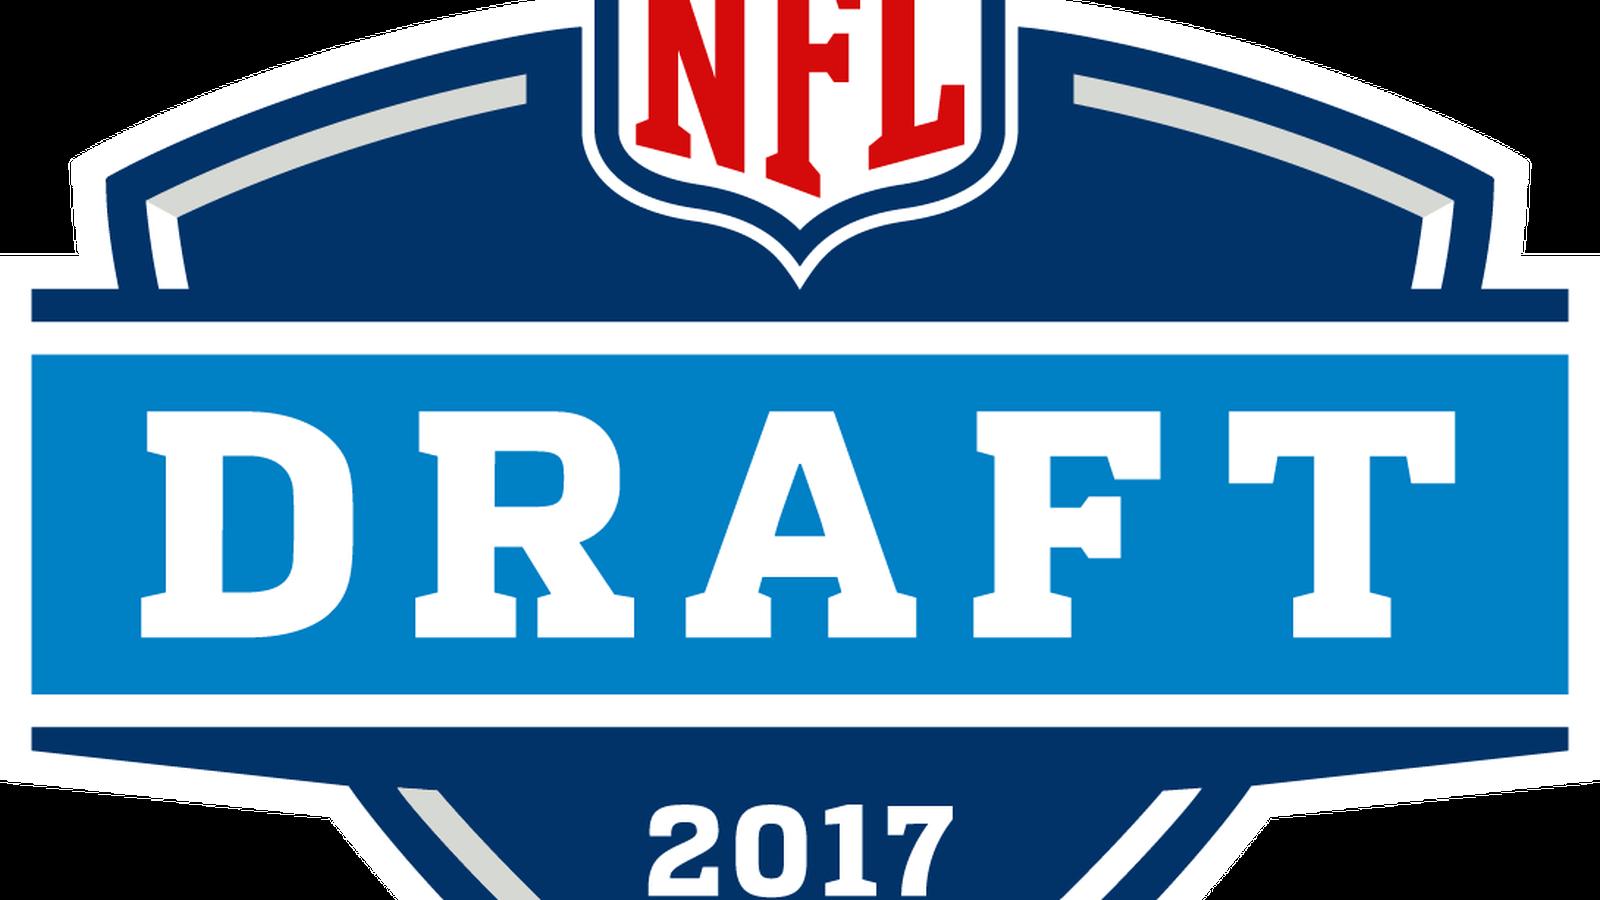 Draft_2017_web.0